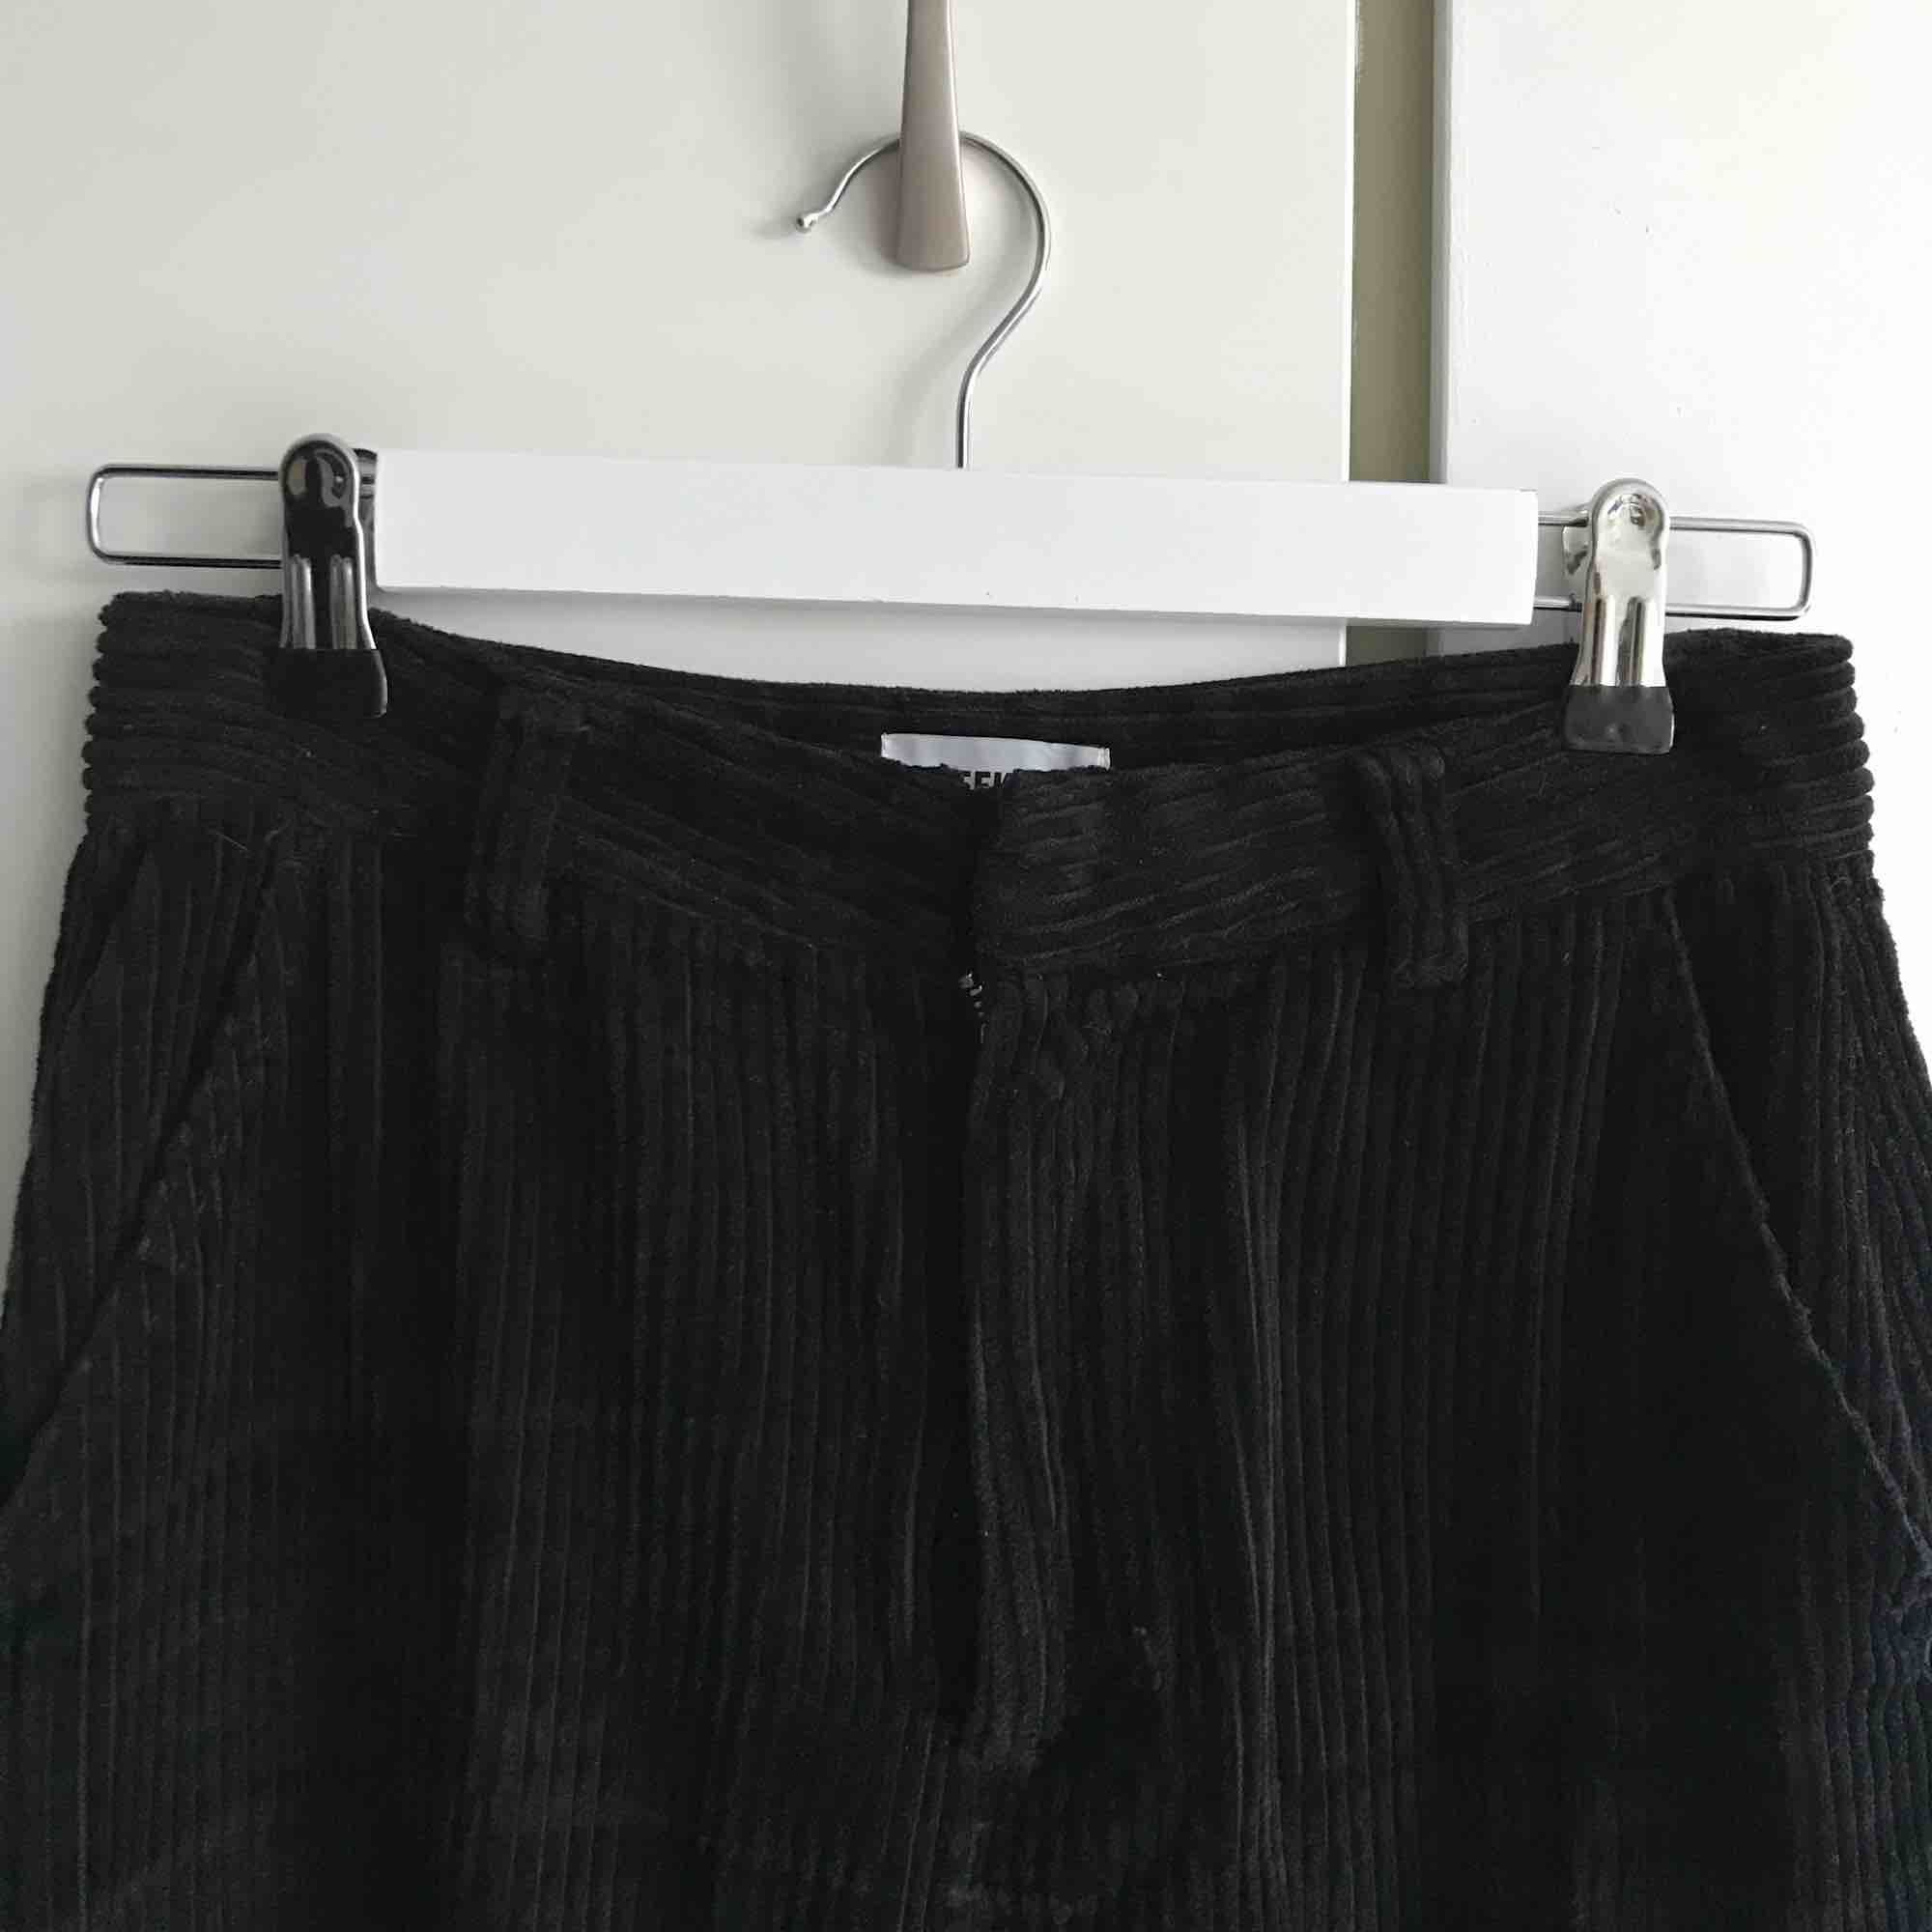 Manchesterbyxor från Weekday, strl 36. Pyttelitet hål vid gylfen, syns på bild 3. Frakt ingår!✨. Jeans & Byxor.